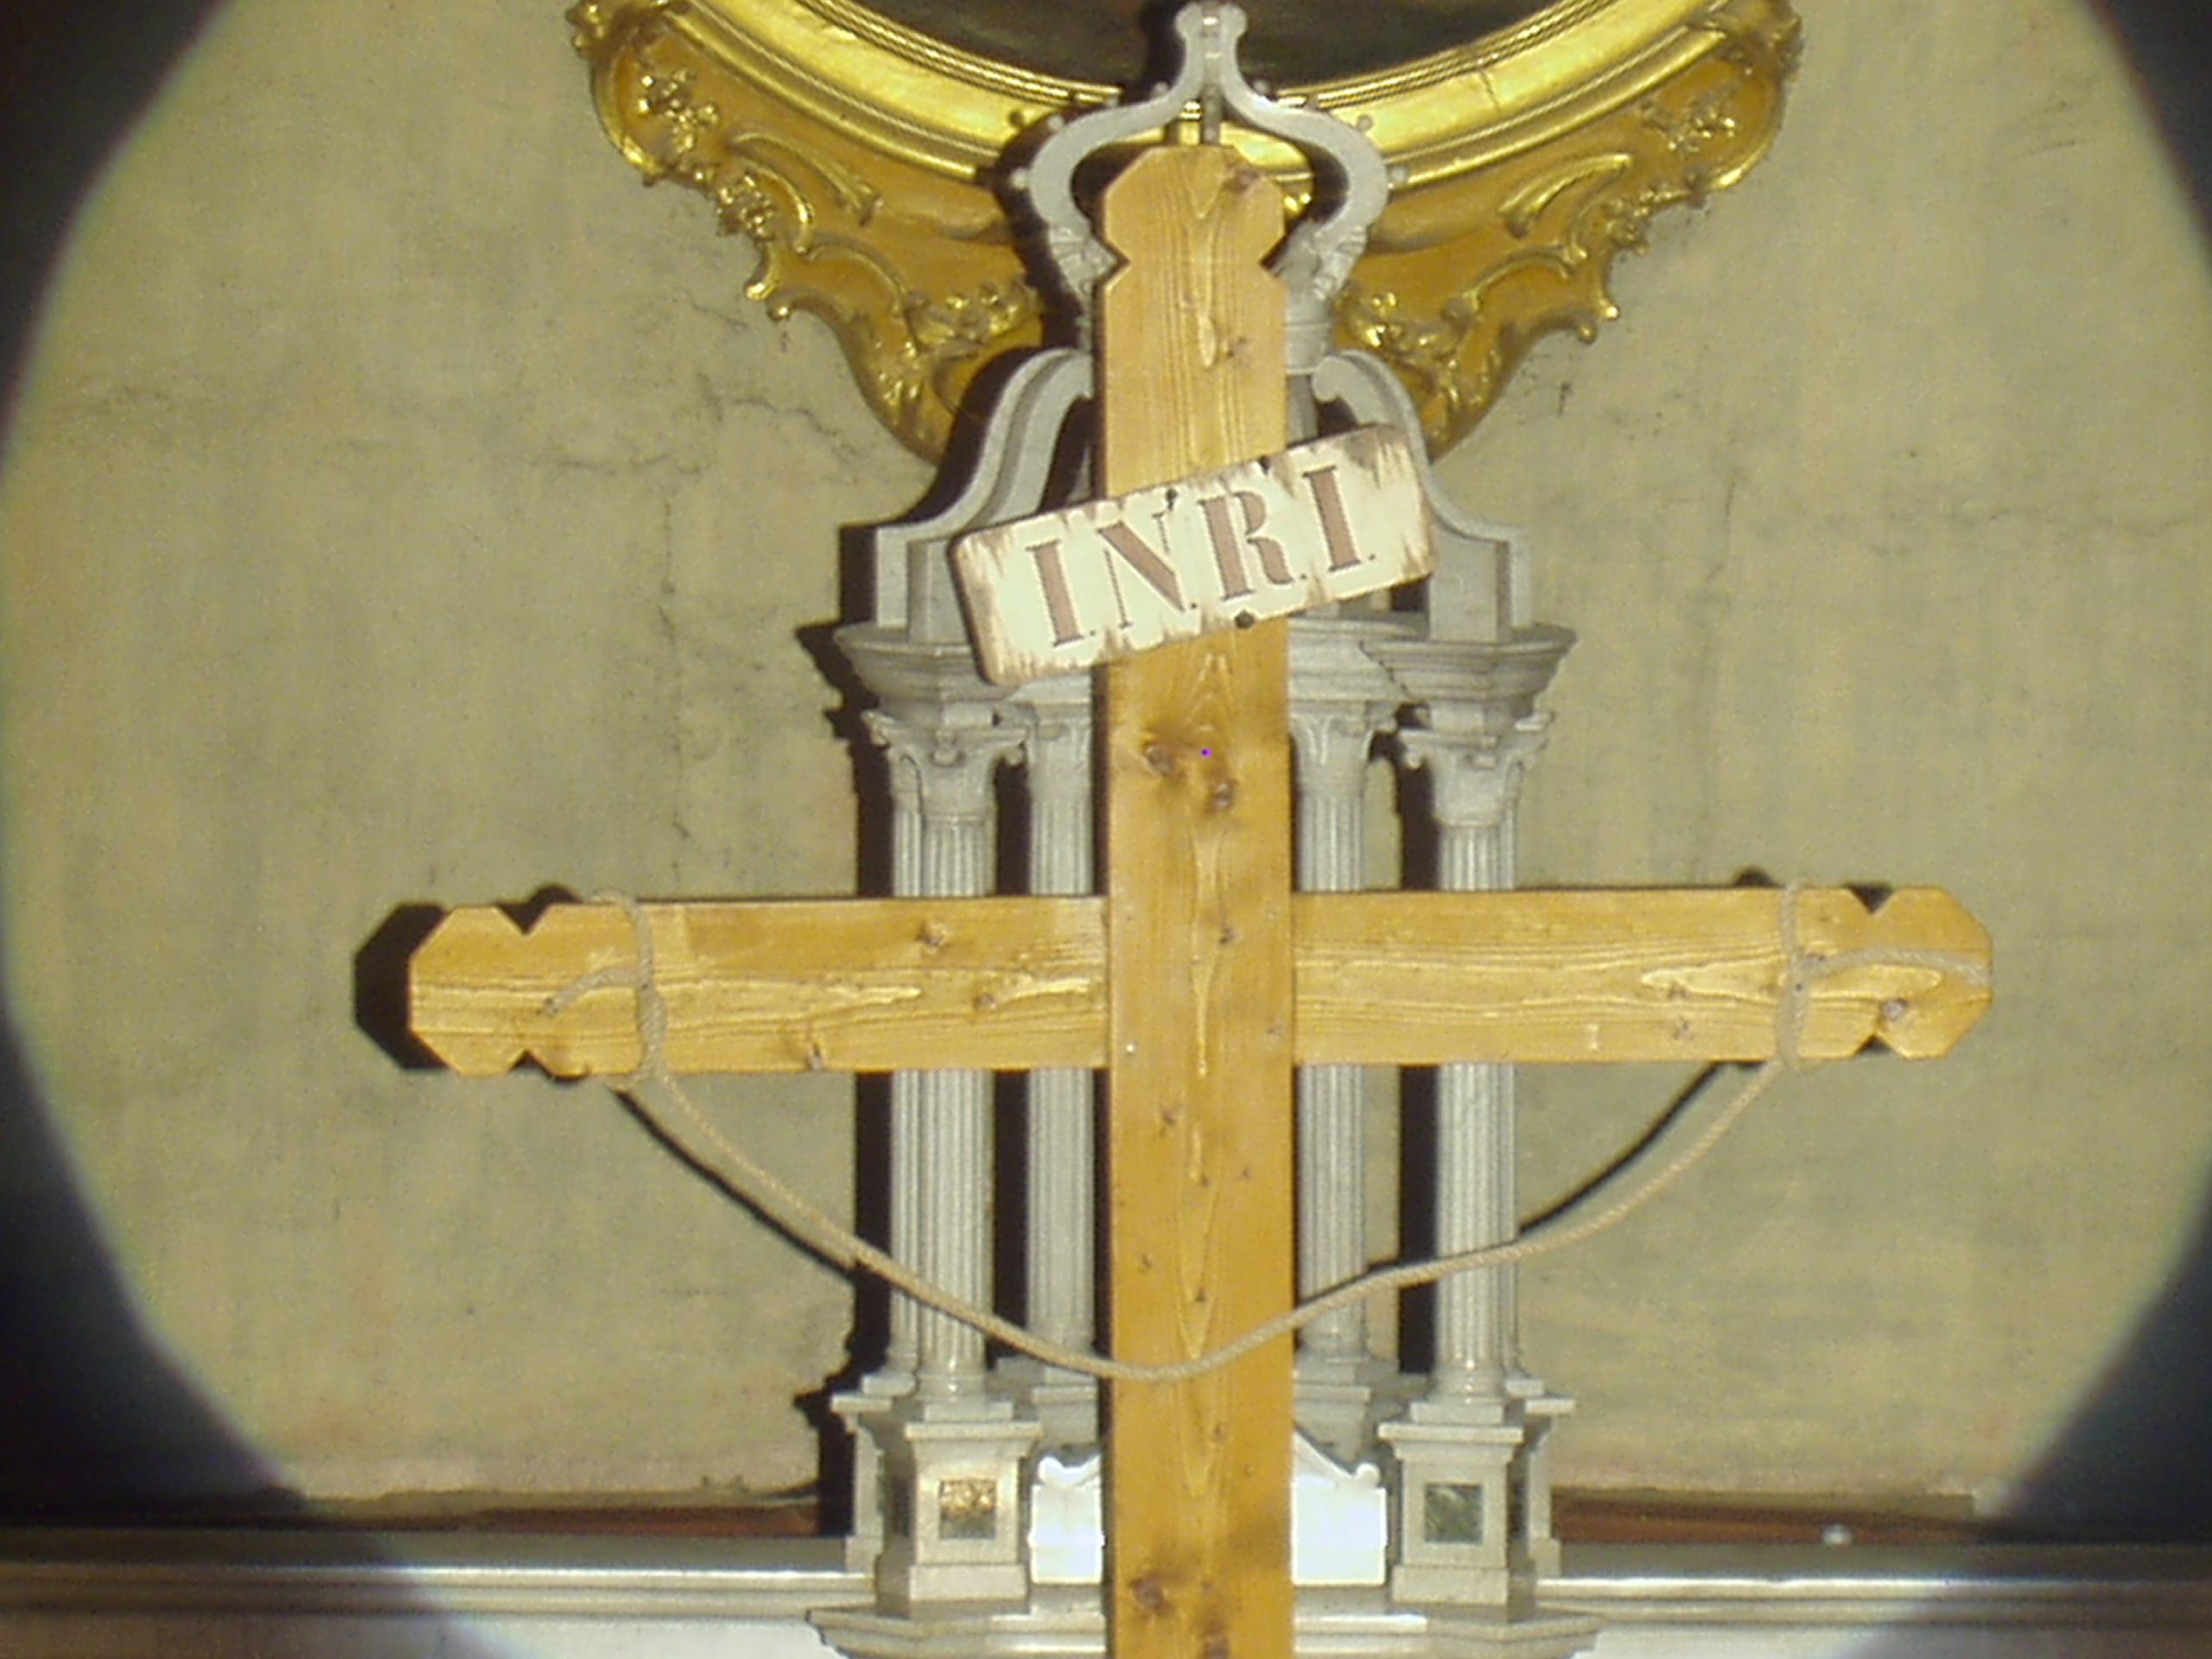 25 MARZO – VENERDI' SANTO: VIA CRUCIS IN COSTUMI D'EPOCA